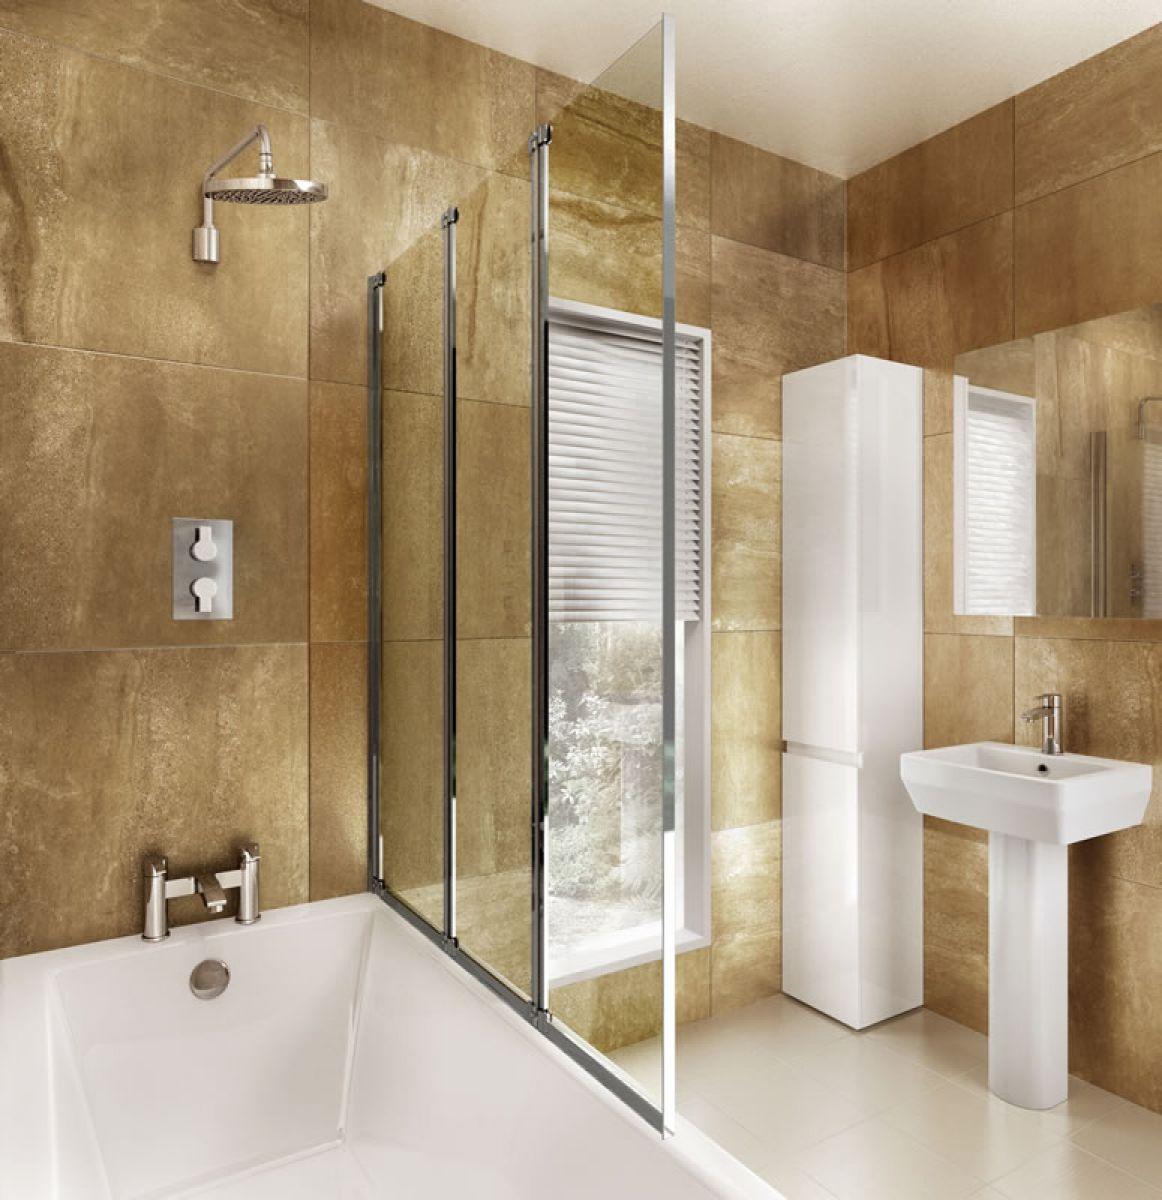 ClearGreen 3 Panel Folding Bath Screen : UK Bathrooms